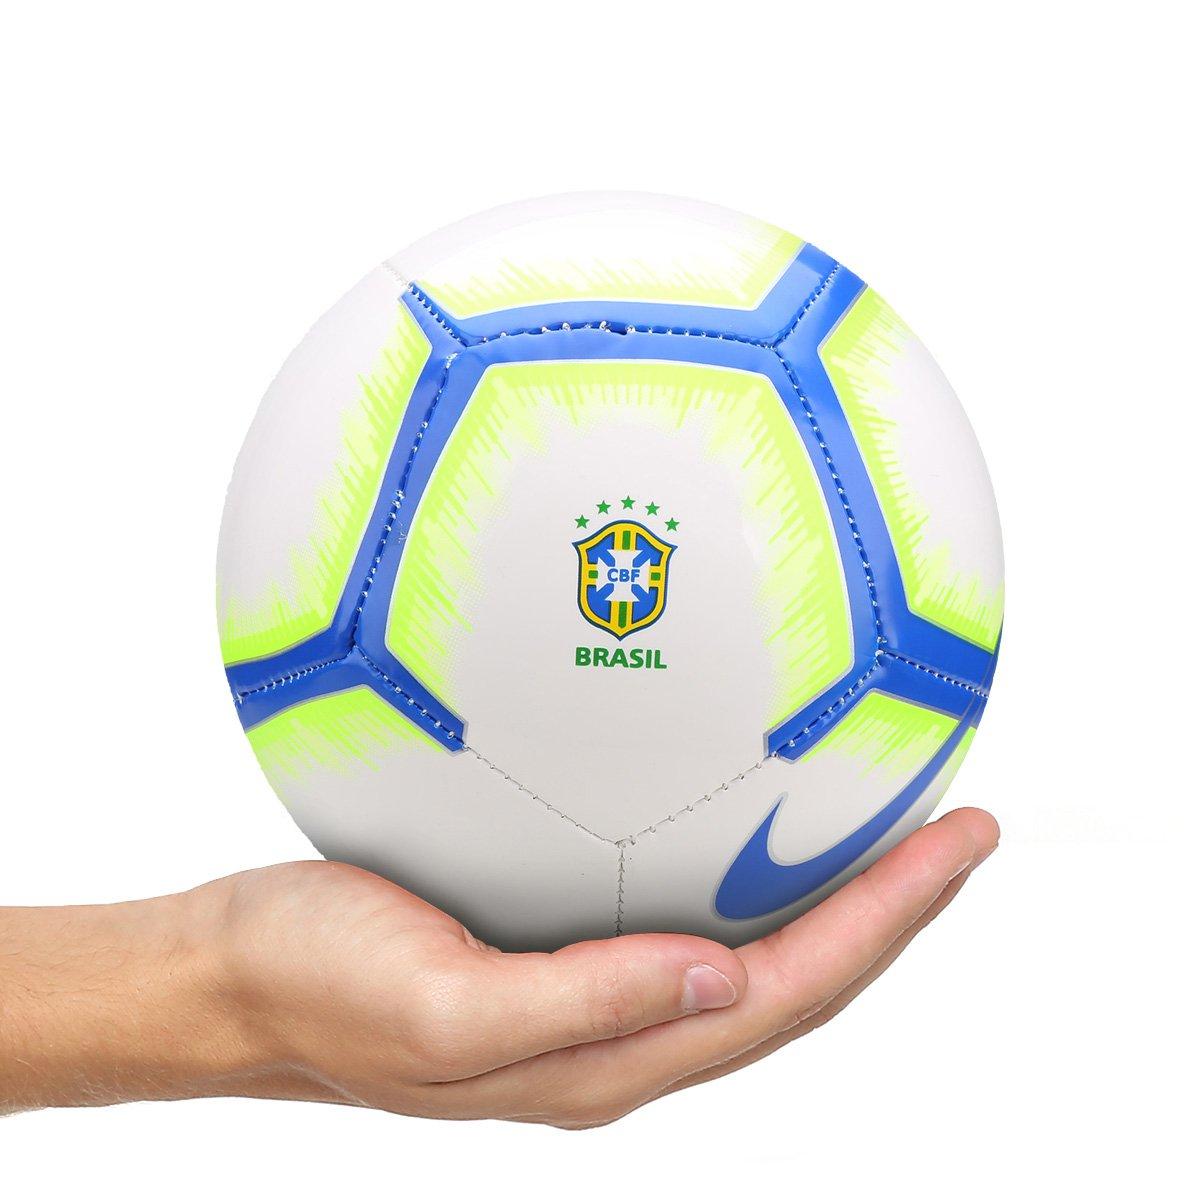 63477b3bde83c Mini bola futebol brasil nike branco e azul compre agora jpg 544x544 Bola  futebol do brasil